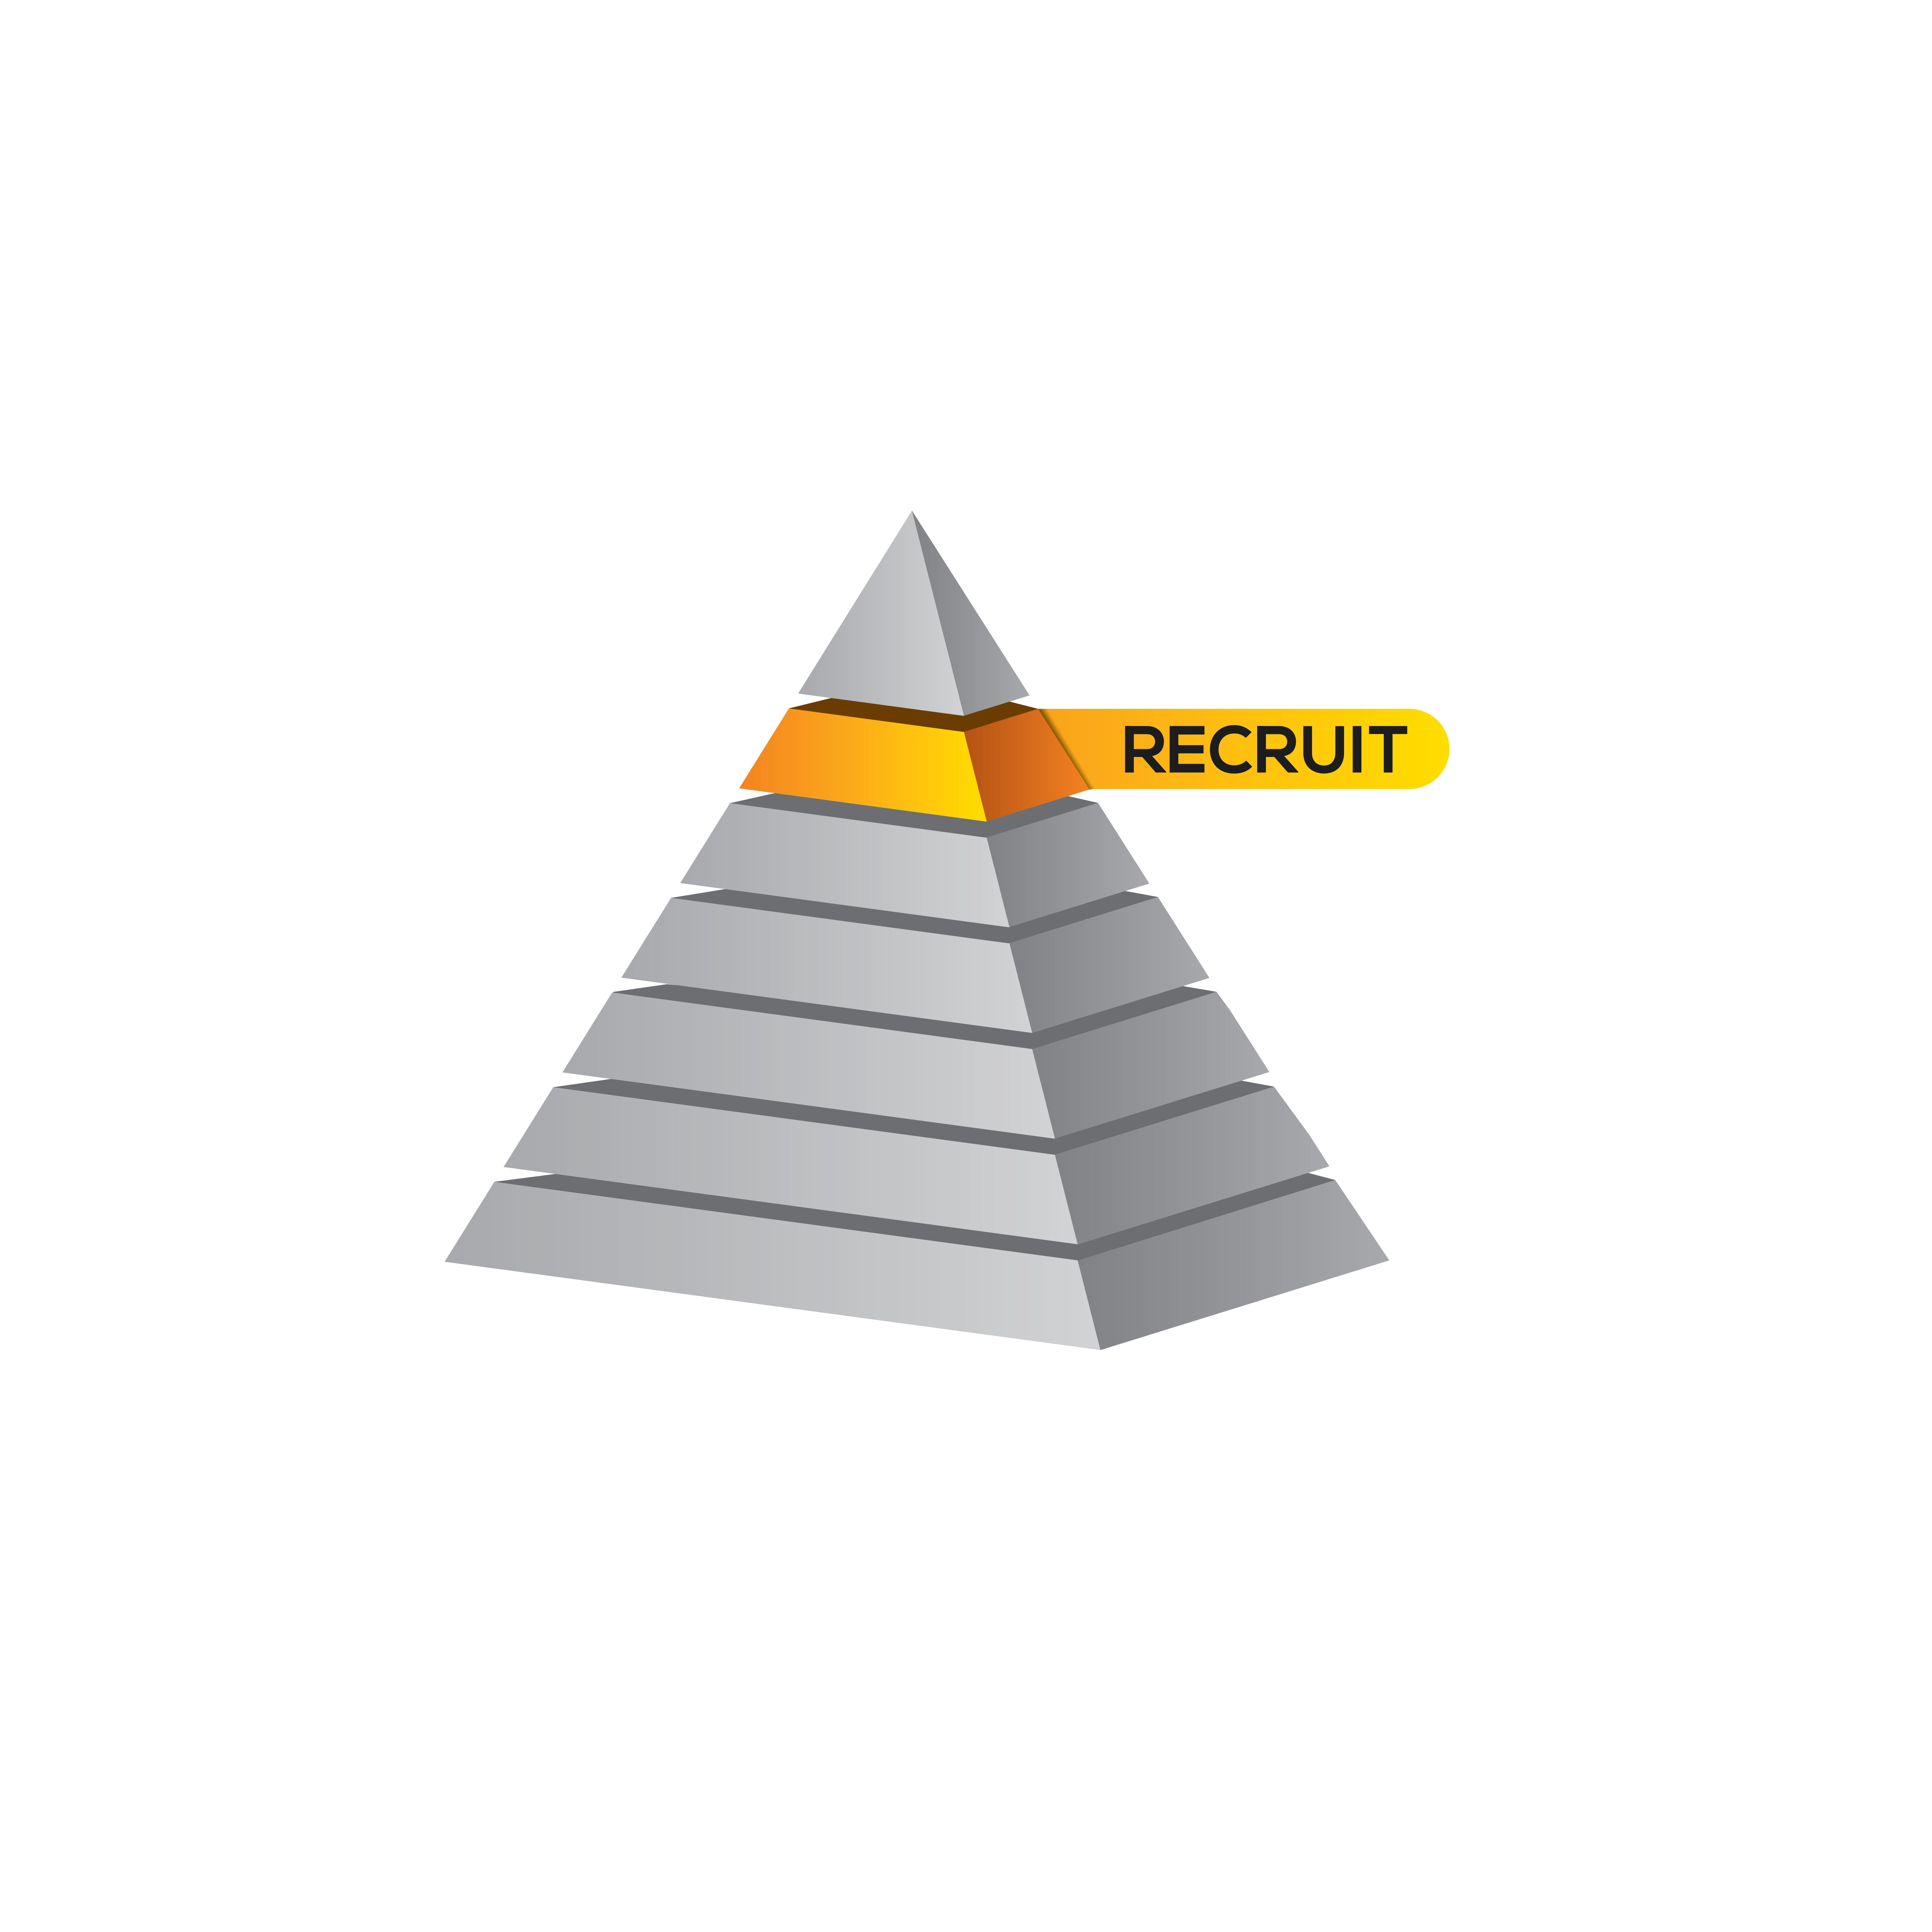 pyramid recruit